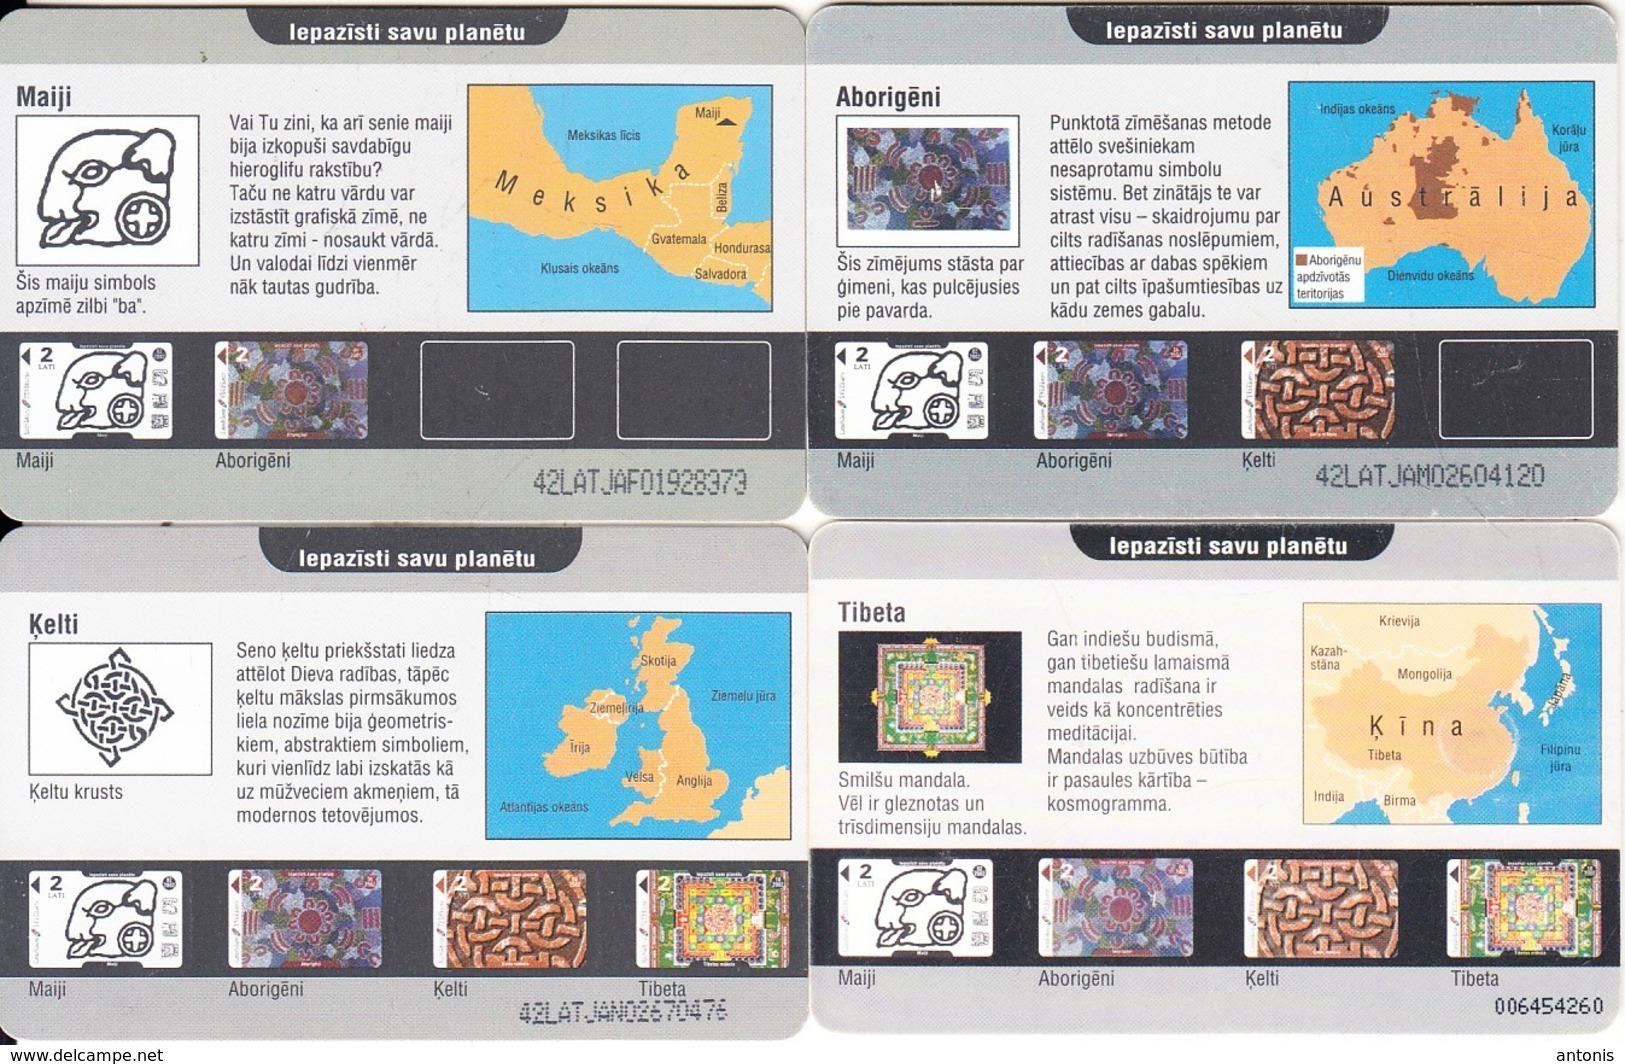 LATVIA - Set Of 4 Cards, Mayan-Aboriginal-Celtic-Tibetan Art, Exp.date 02-06-08-10/02, Used - Phonecards